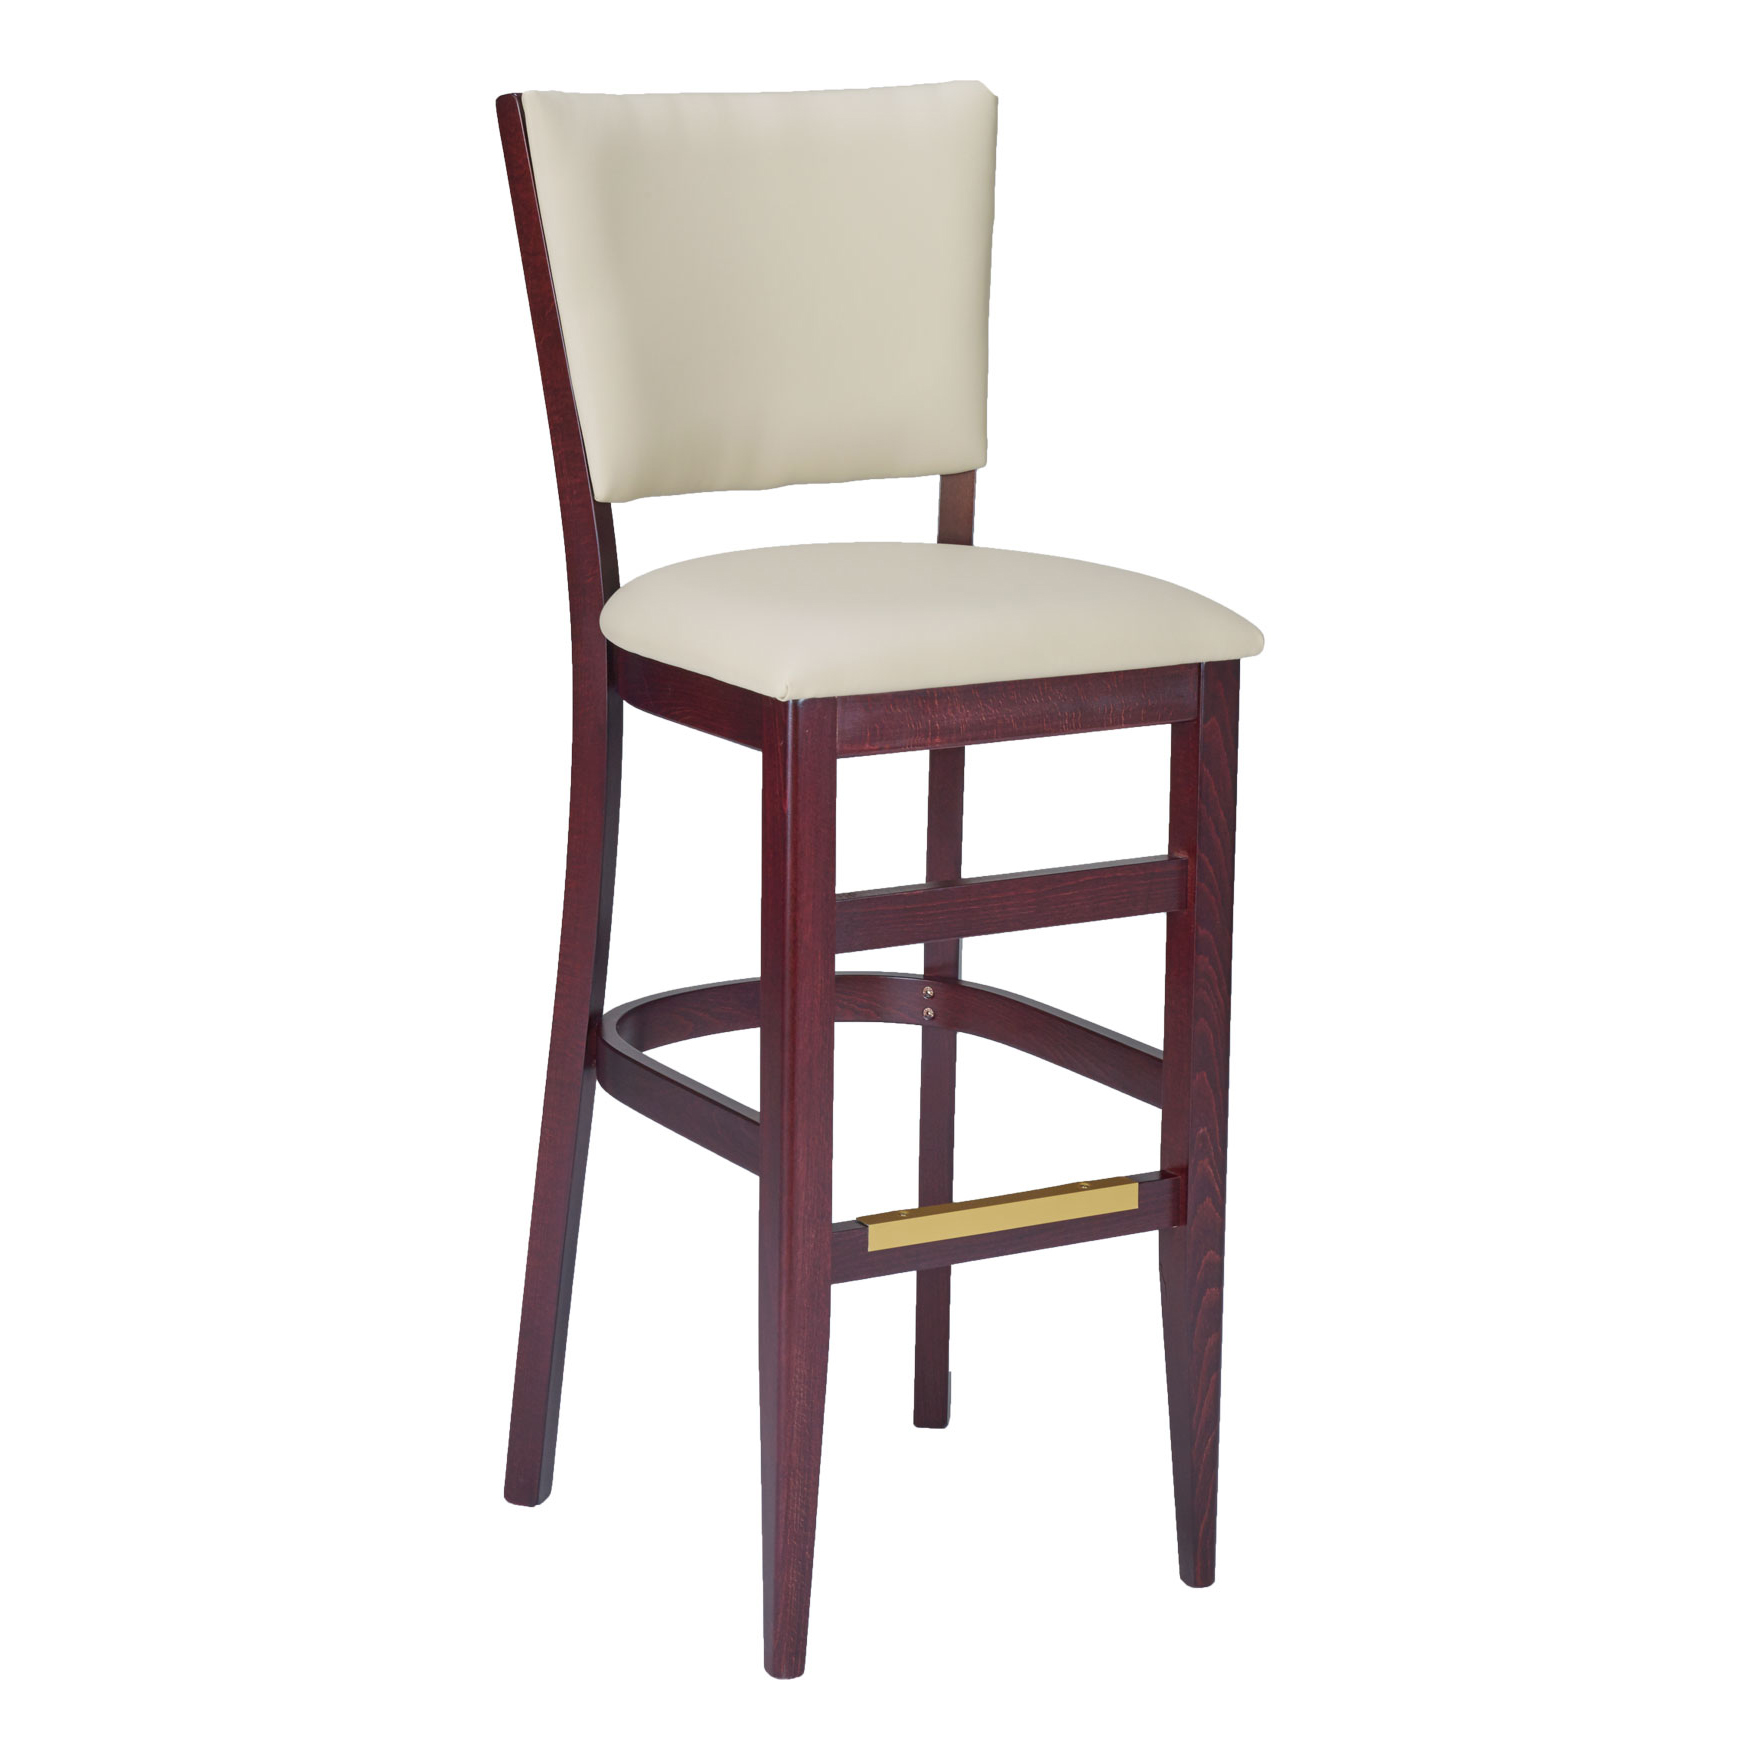 Florida Seating RV-MONTERO B COM bar stool, indoor